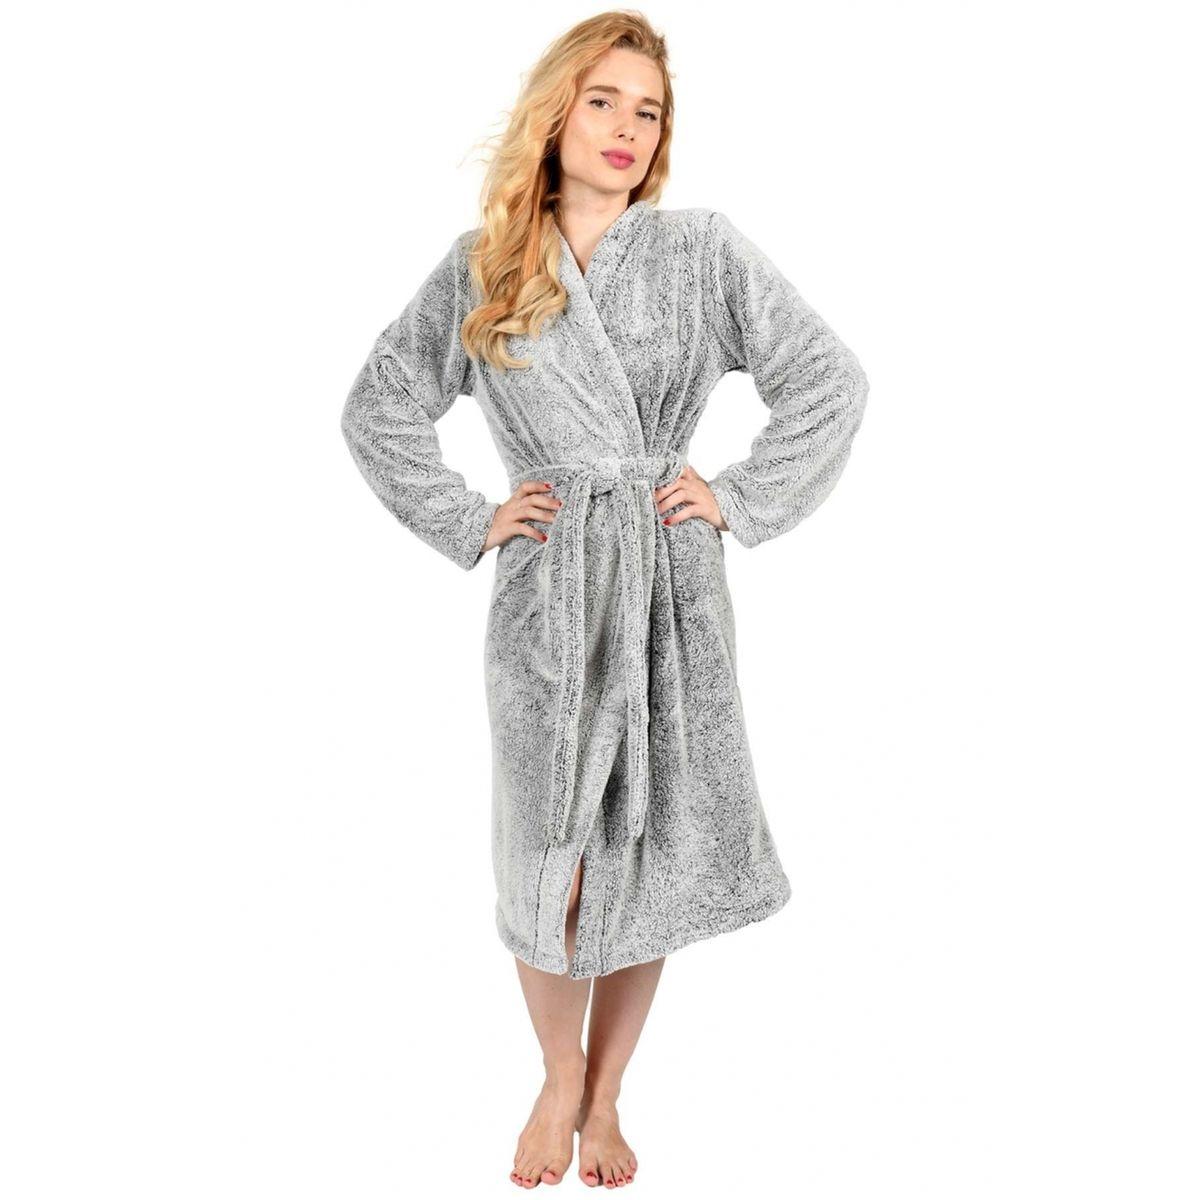 Veste Polaire Kimono Adulte CHAMONIX